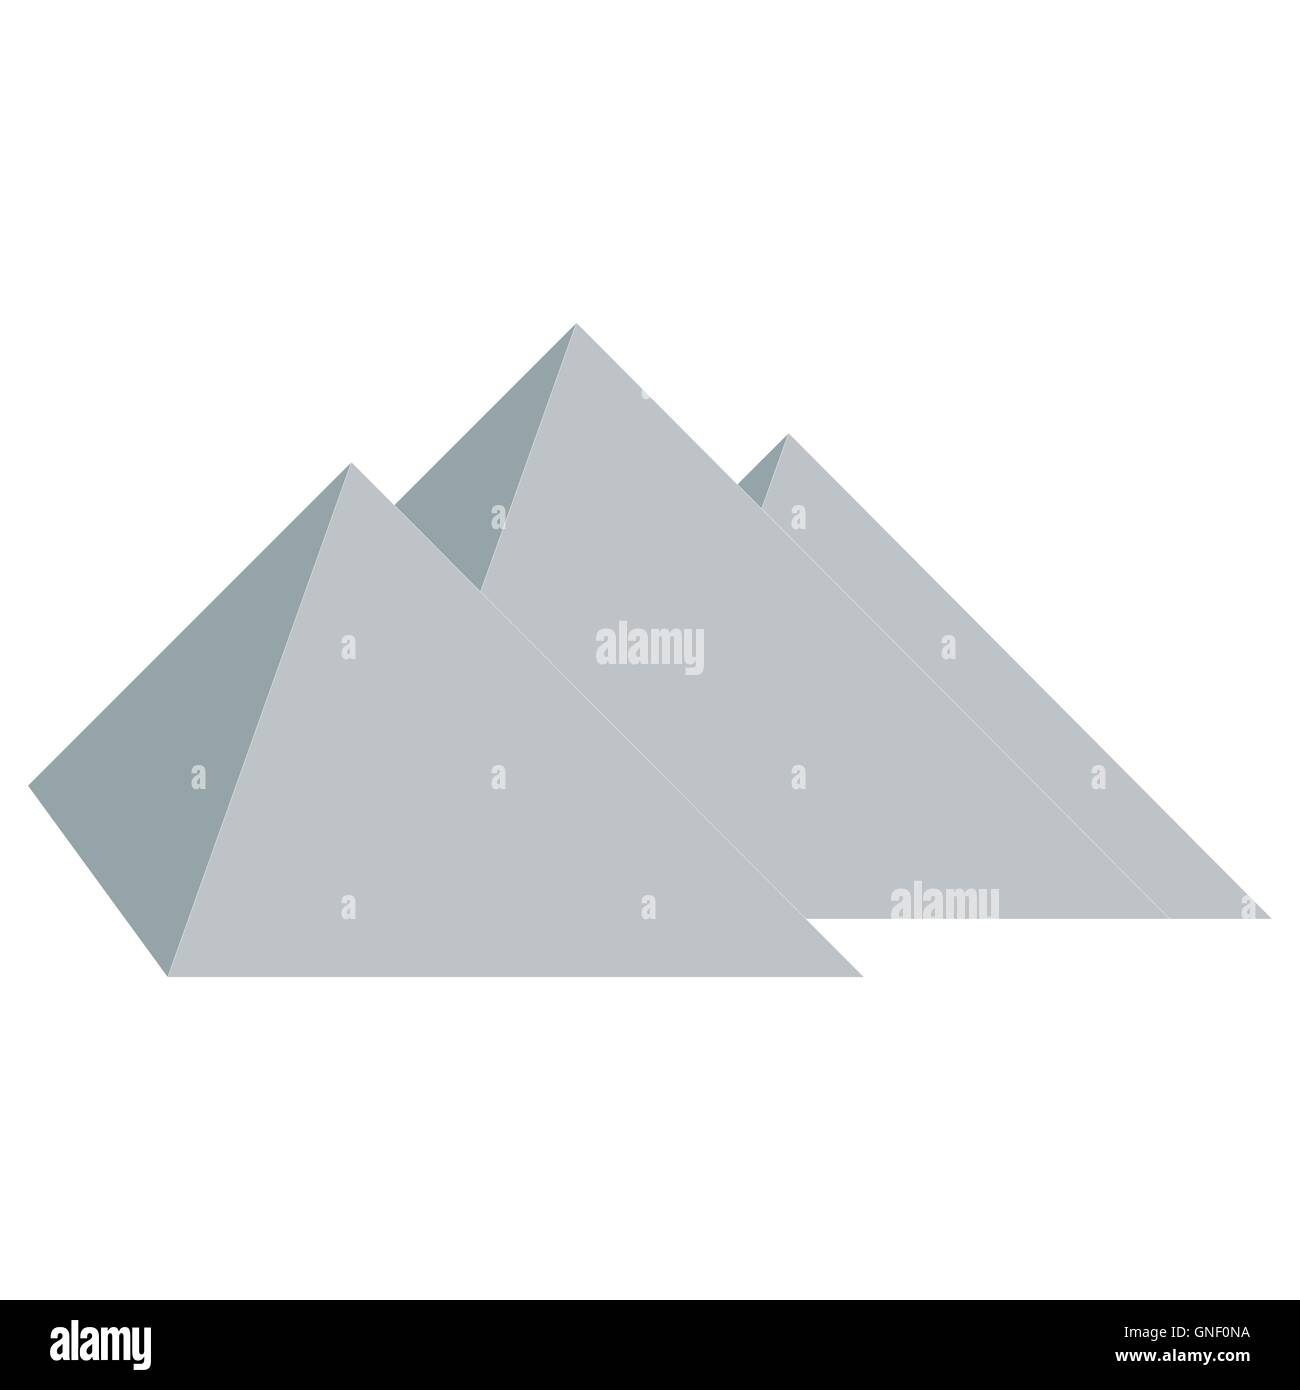 Magnificent Square Pyramid Template Ideas - Wordpress Themes Ideas ...